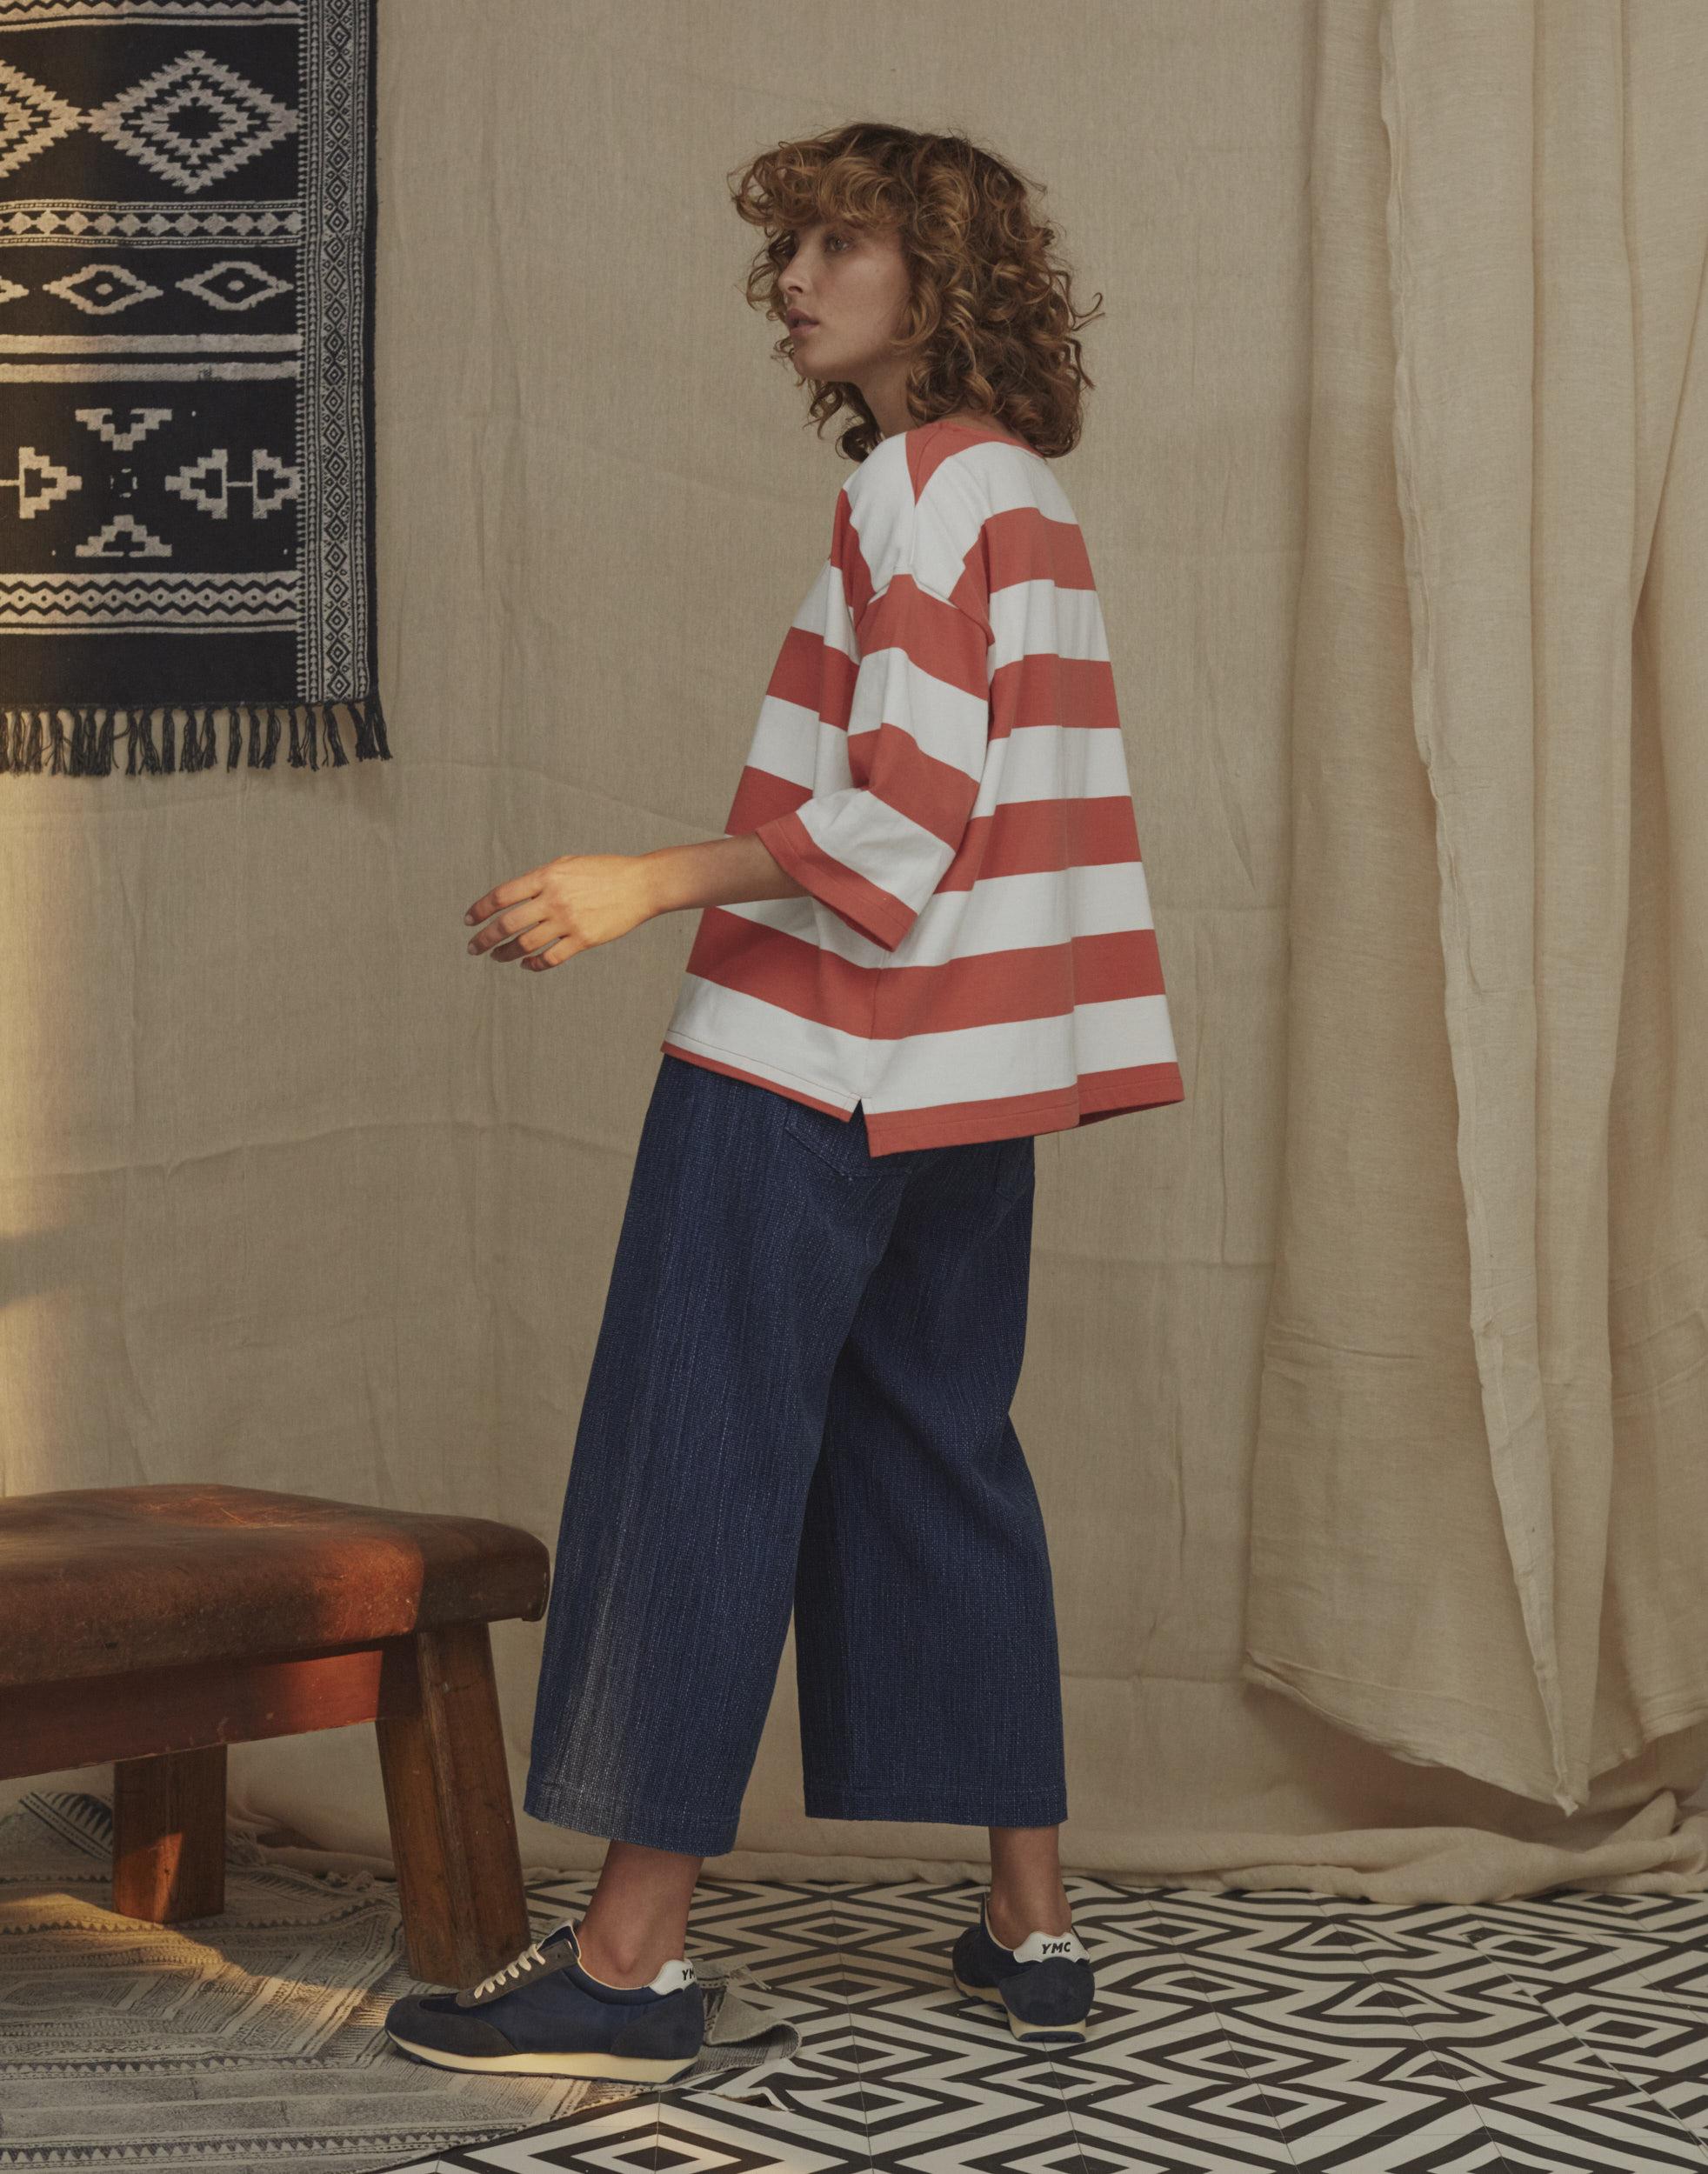 ymc-ss17-collection-okoro-women-fashion-folkr-5